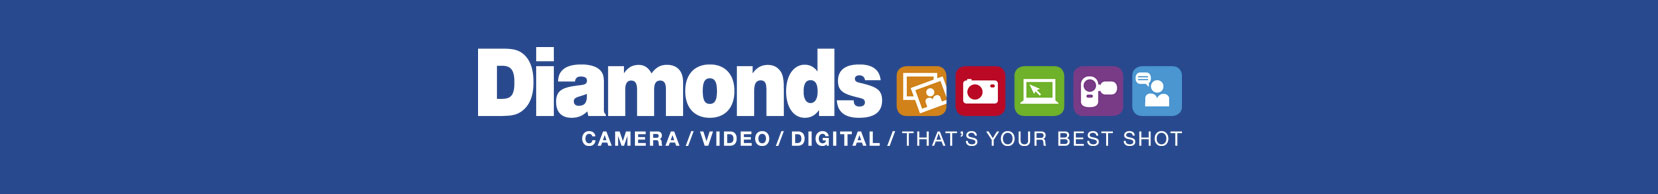 Diamonds Camera Video & Digital